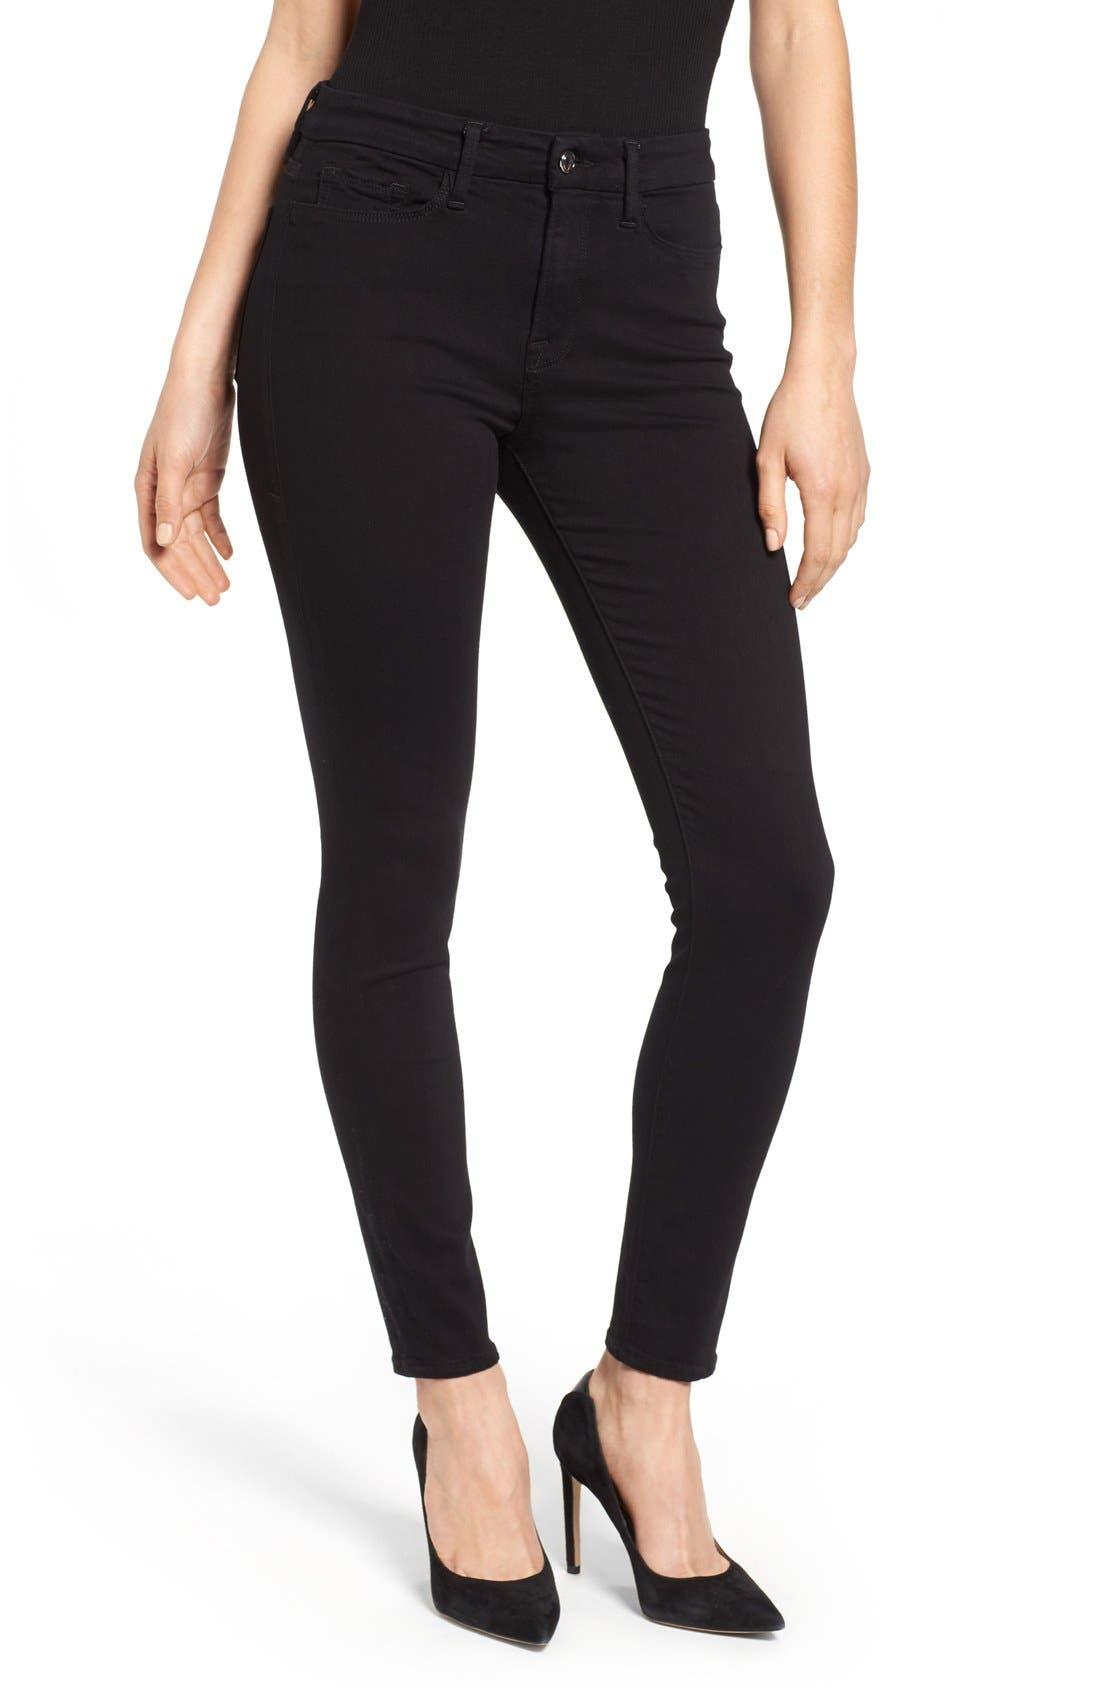 Alternate Image 1 Selected - Good American Good Legs High Rise Skinny Jeans